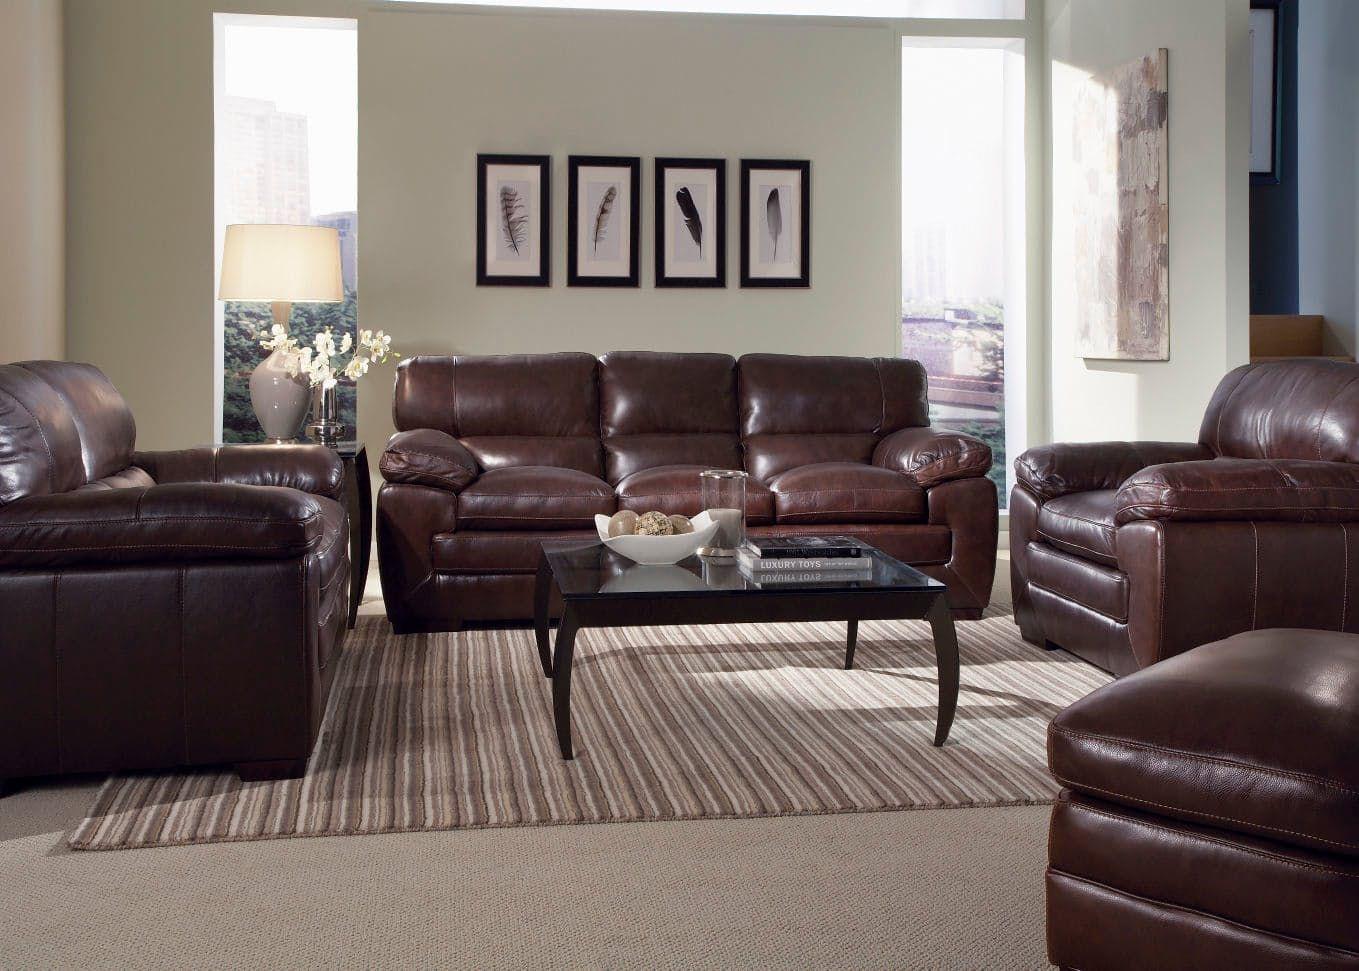 Amarillo Walnut Pub Back Sofa And Love Seat 100 Top Grain Leather Seating By Simon Li Set 2299 00 Sof Leather Sofa Set Furniture Genuine Leather Sofa